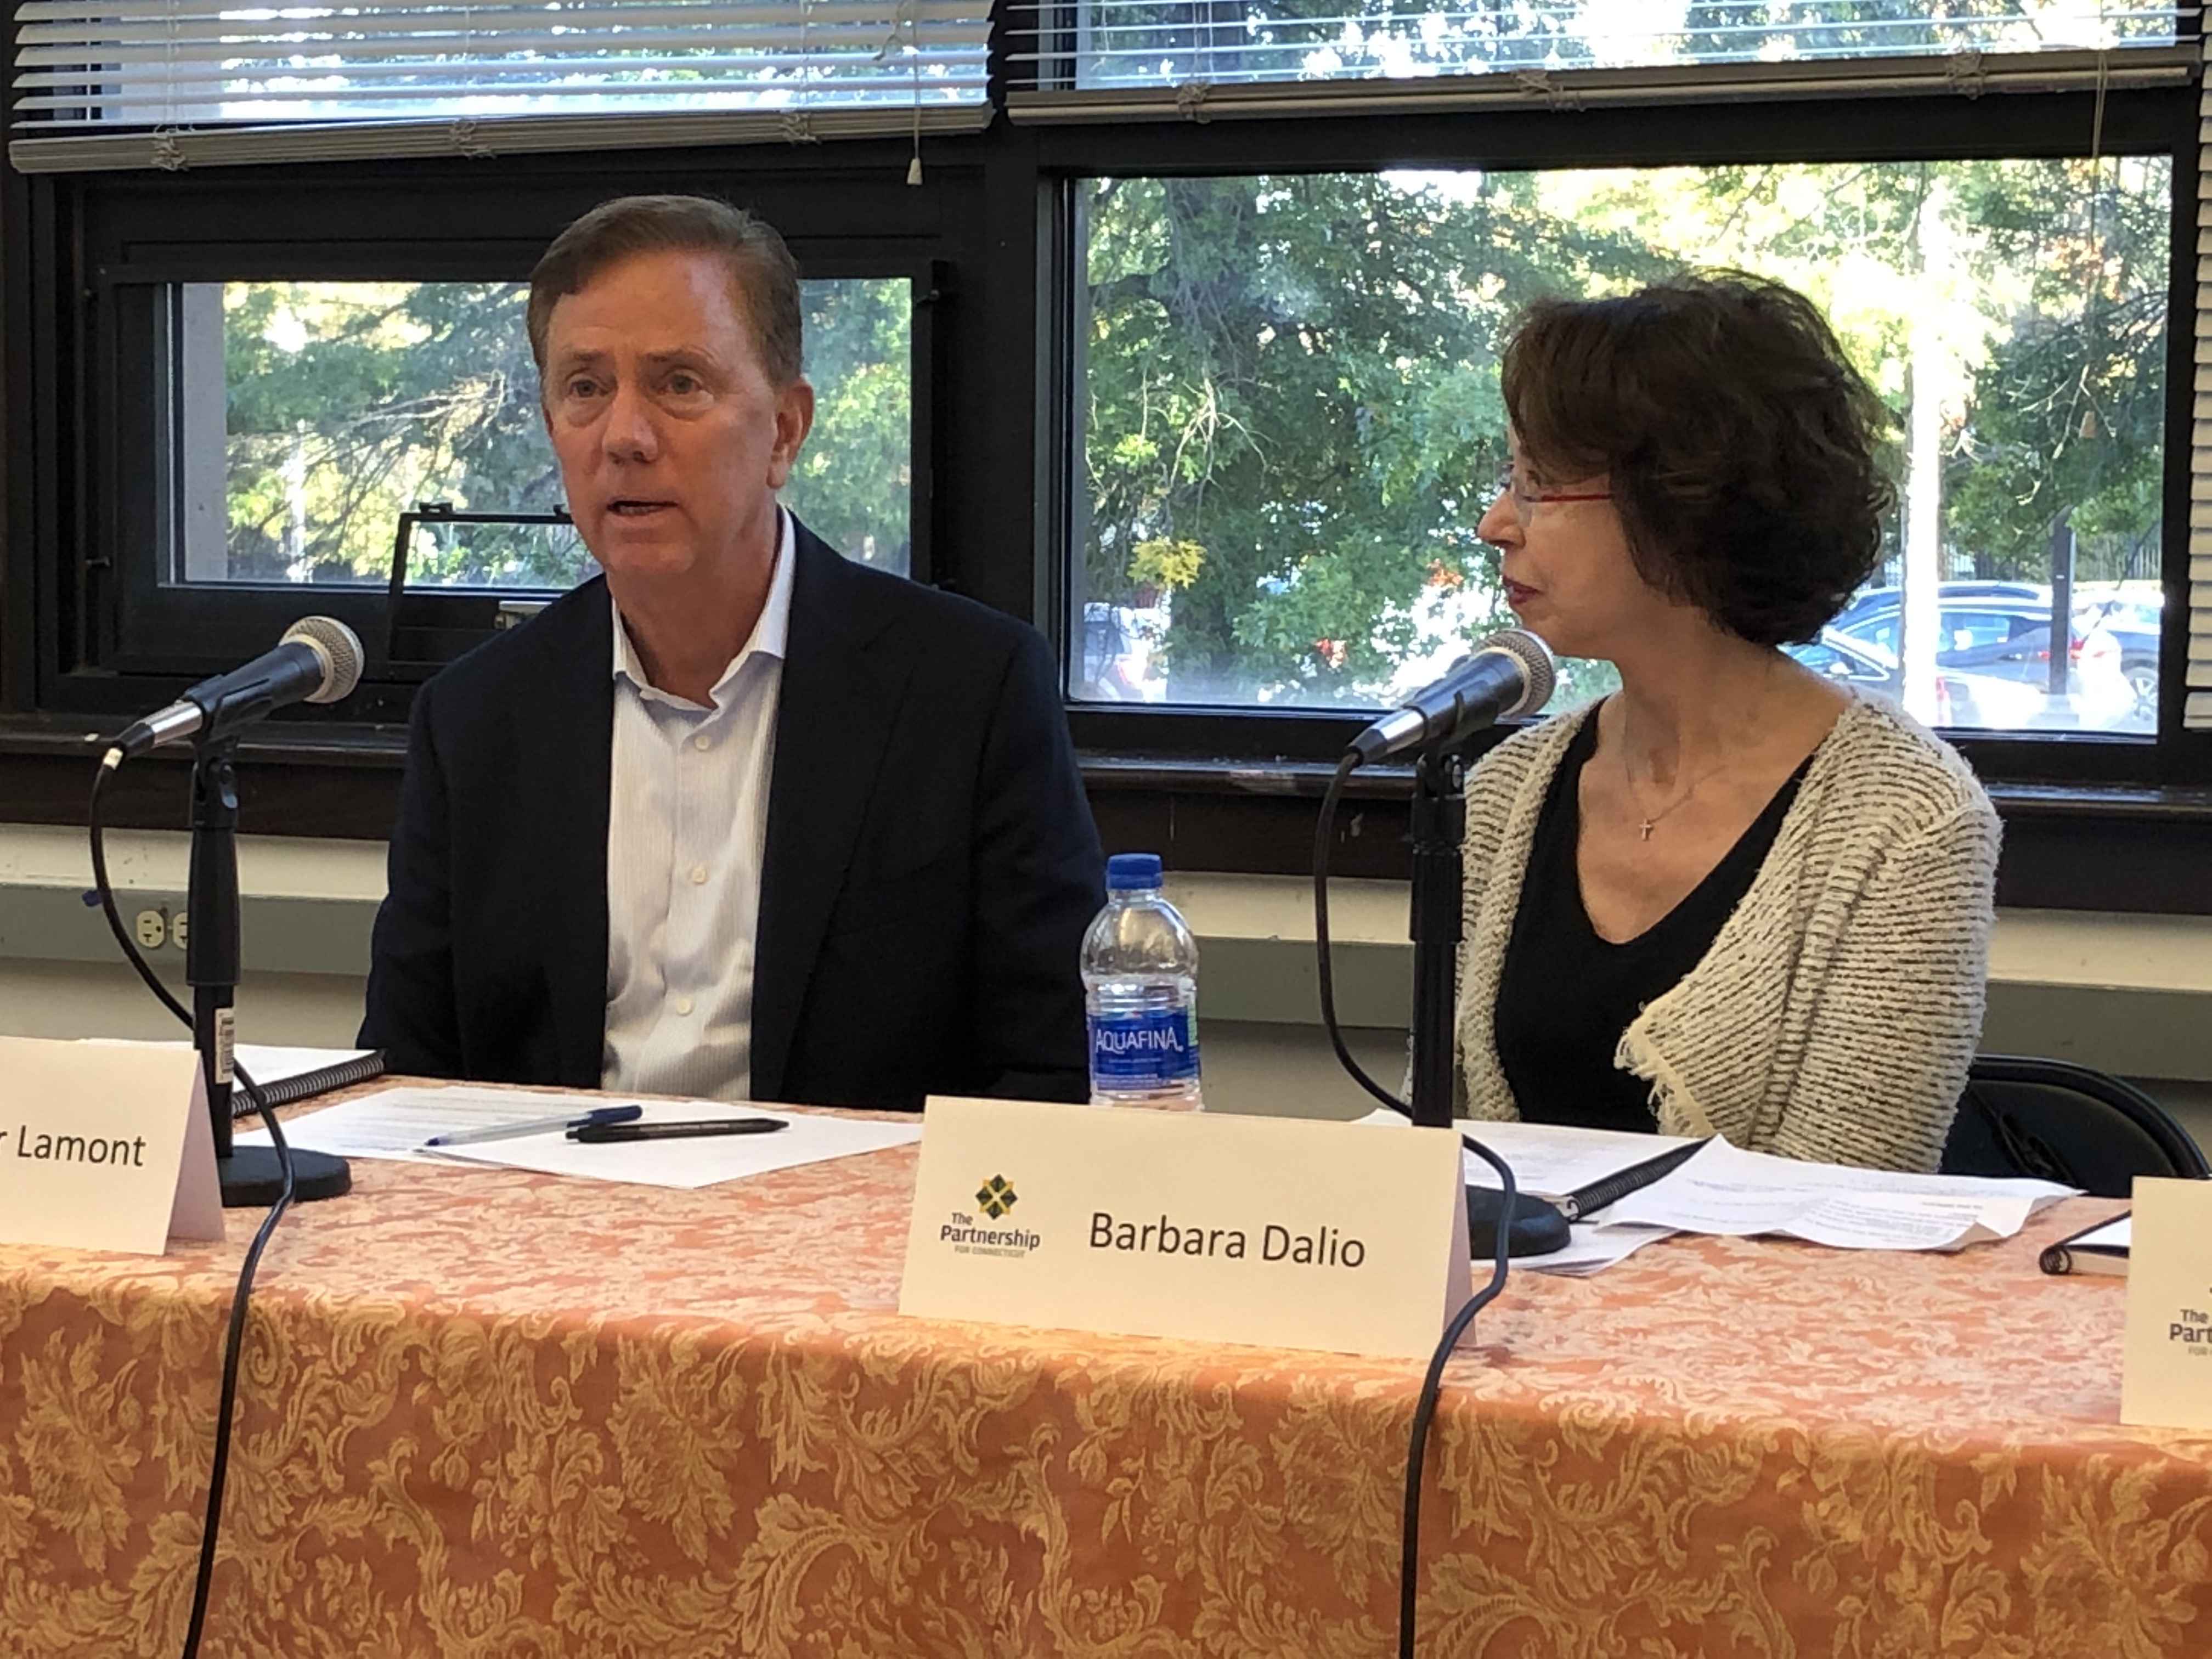 Education partnership keeps most deliberations behind closed doors